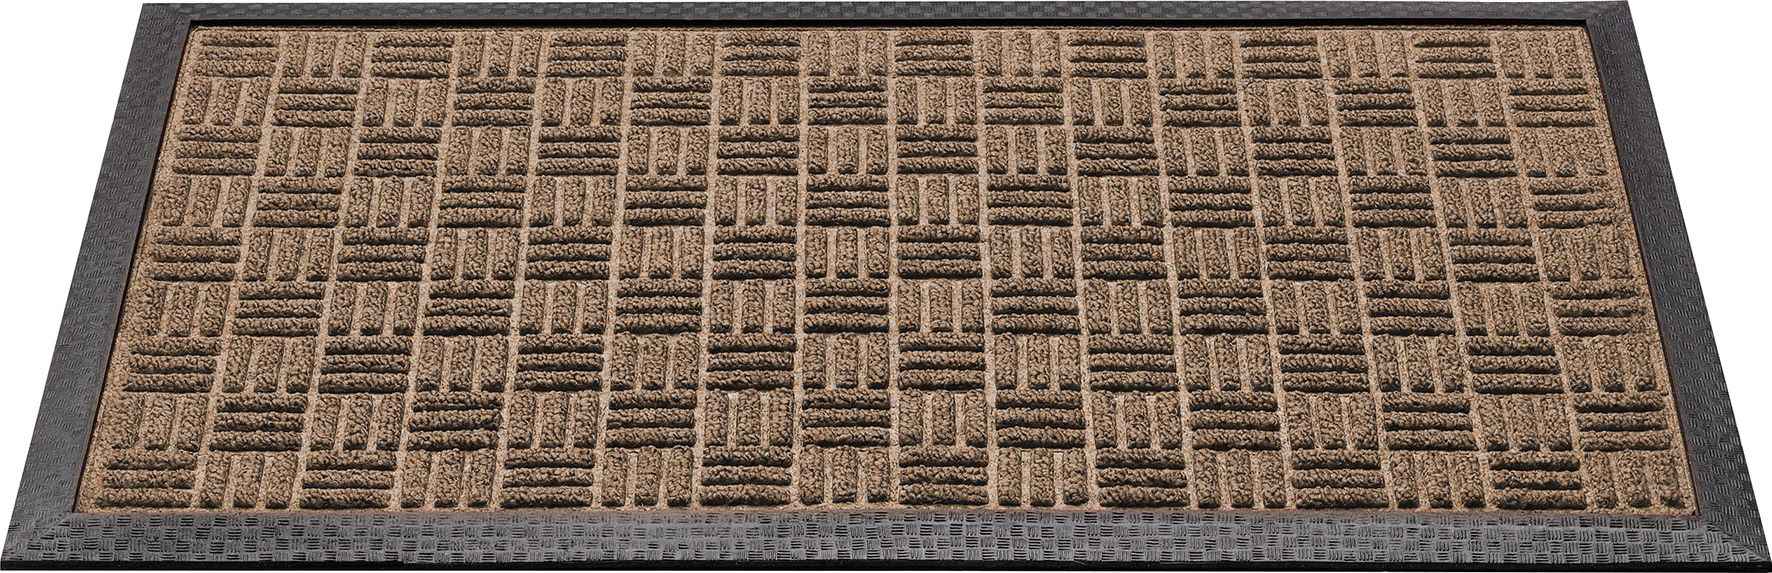 Uksematt Hamat Supreme Beige/ Beezh  45 x 75 cm